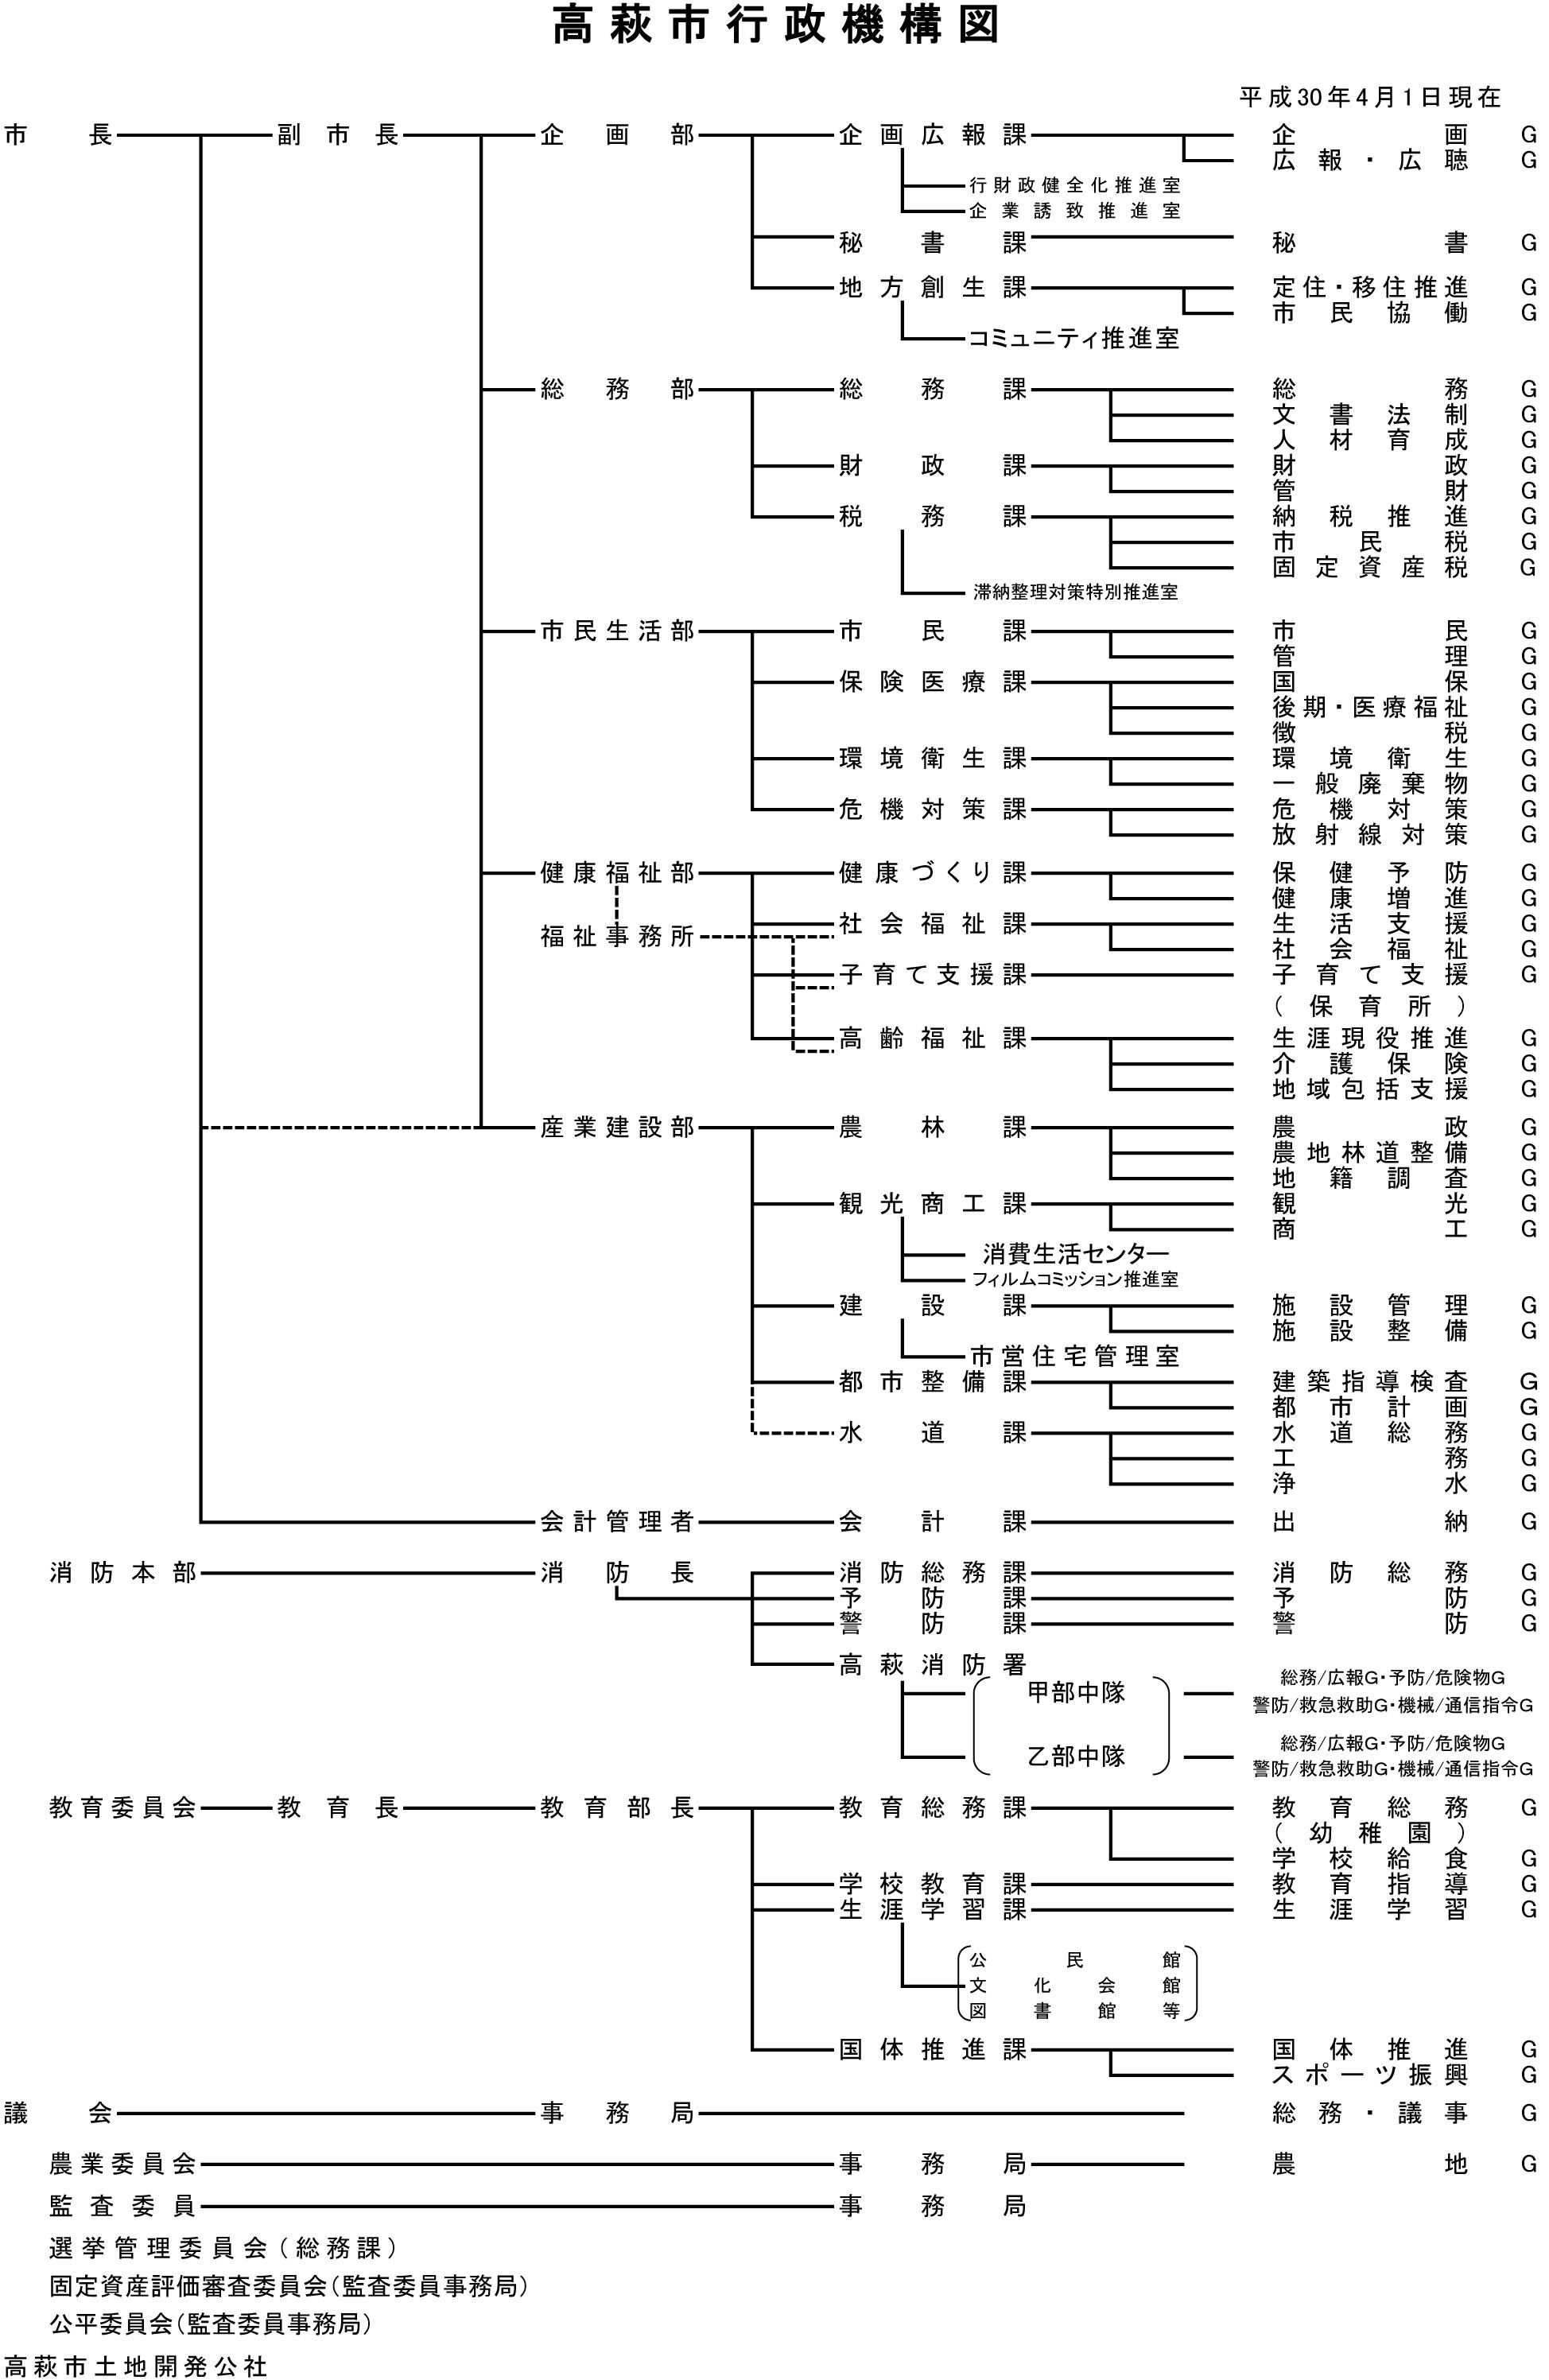 『H30 行政組織図』の画像